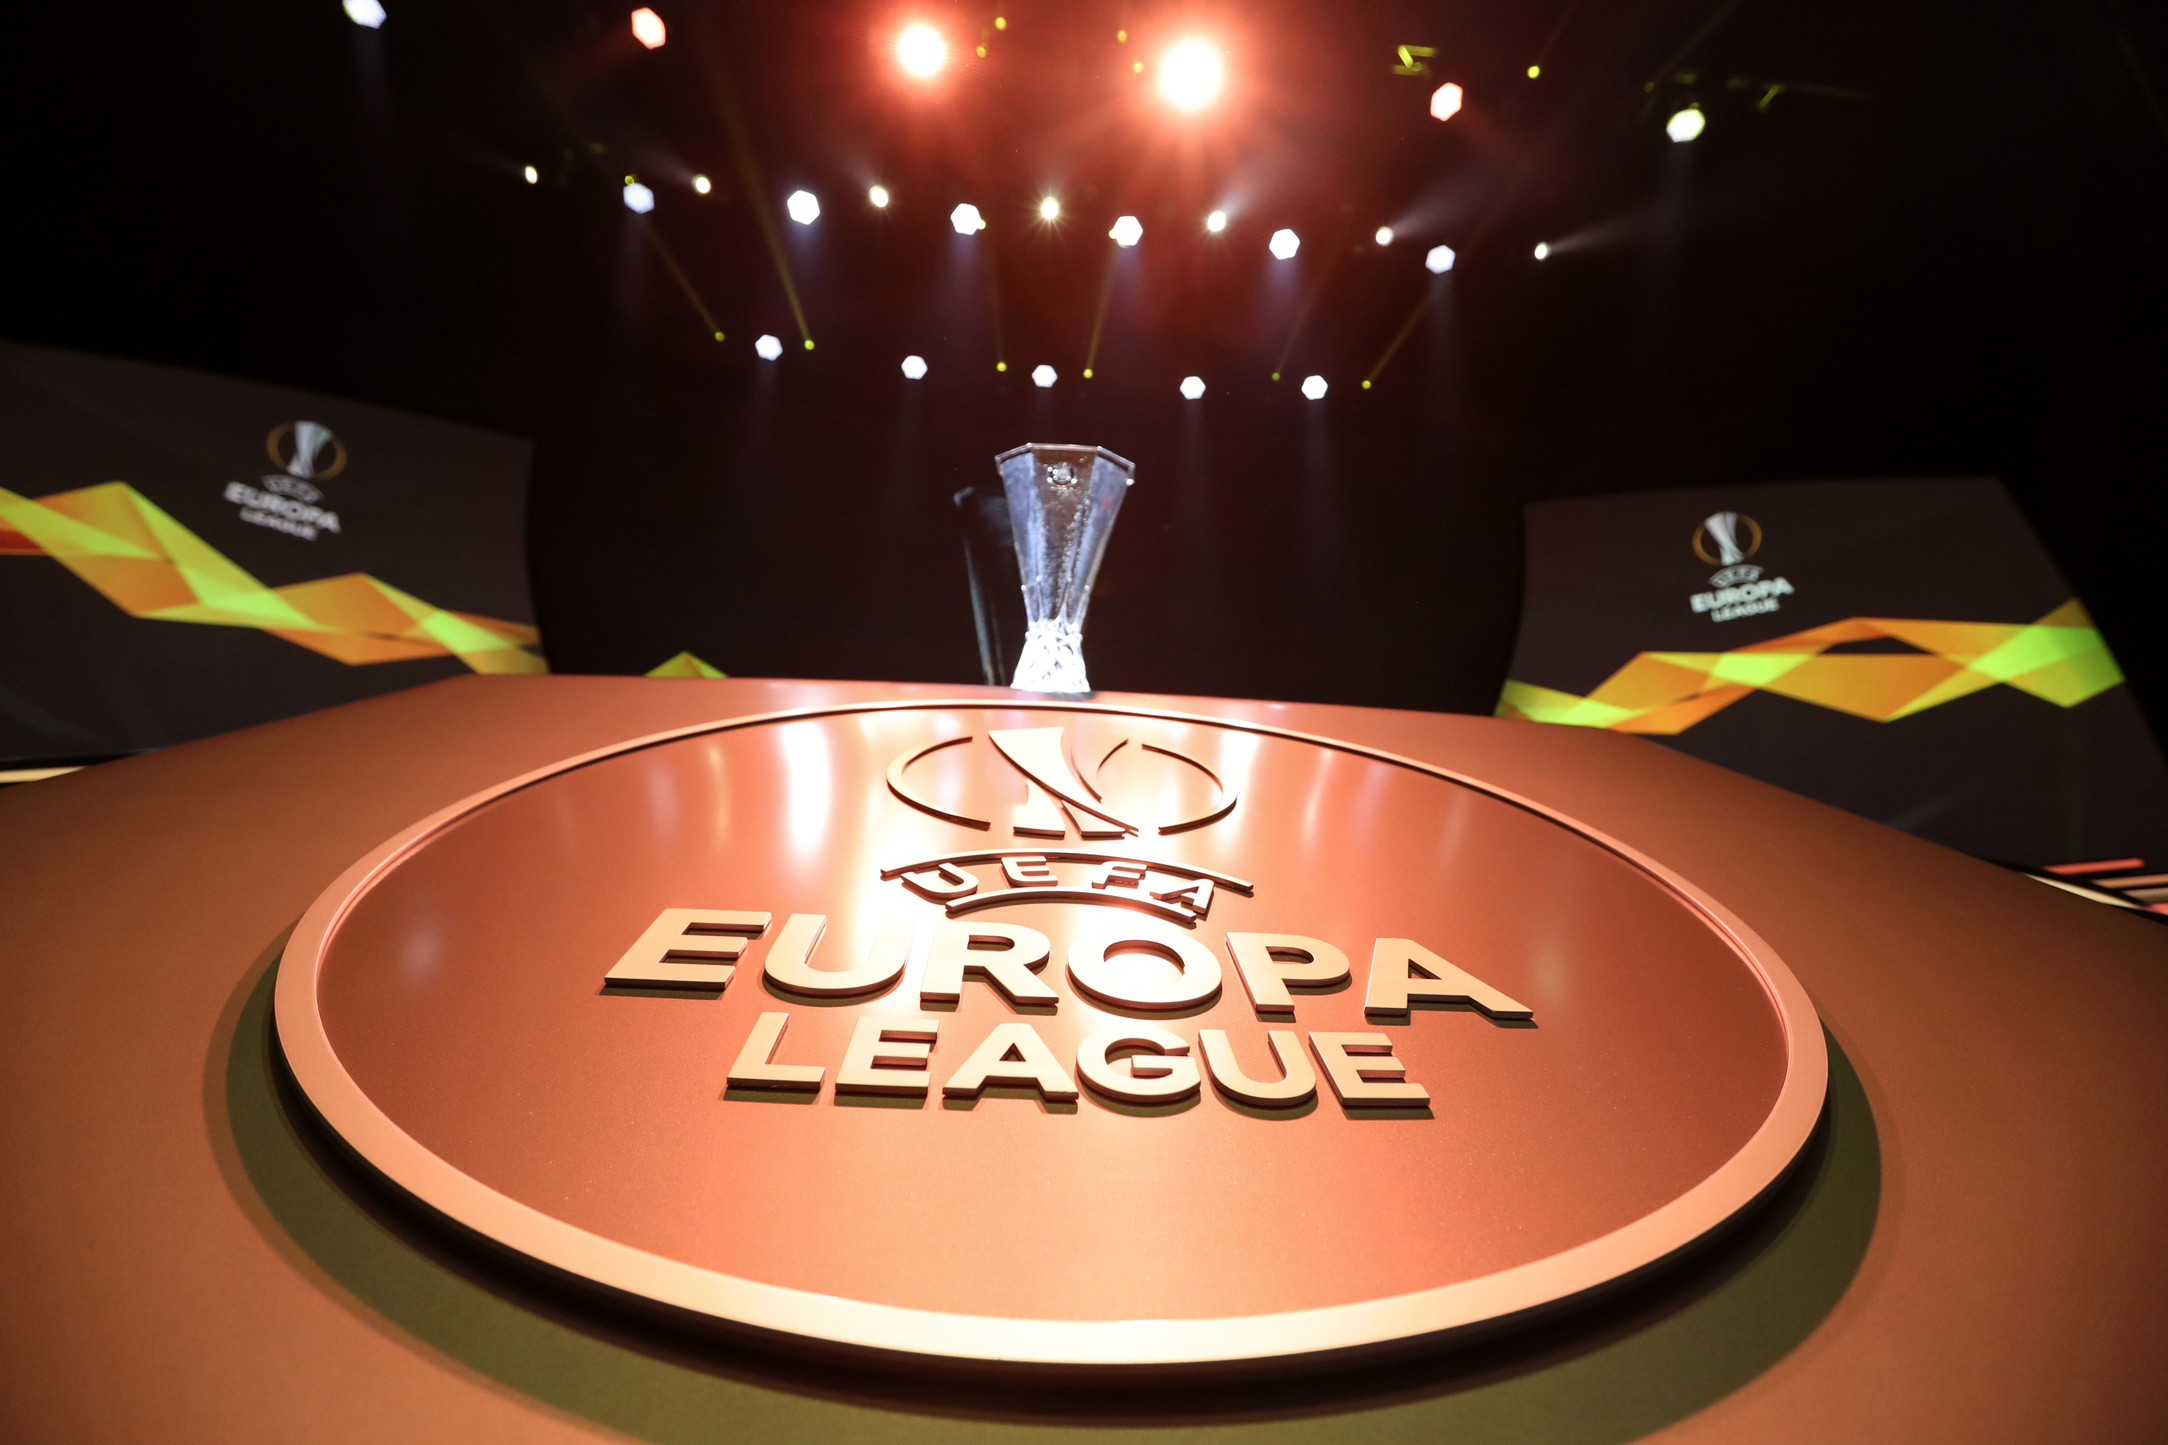 Europa League Achtelfinale 2021